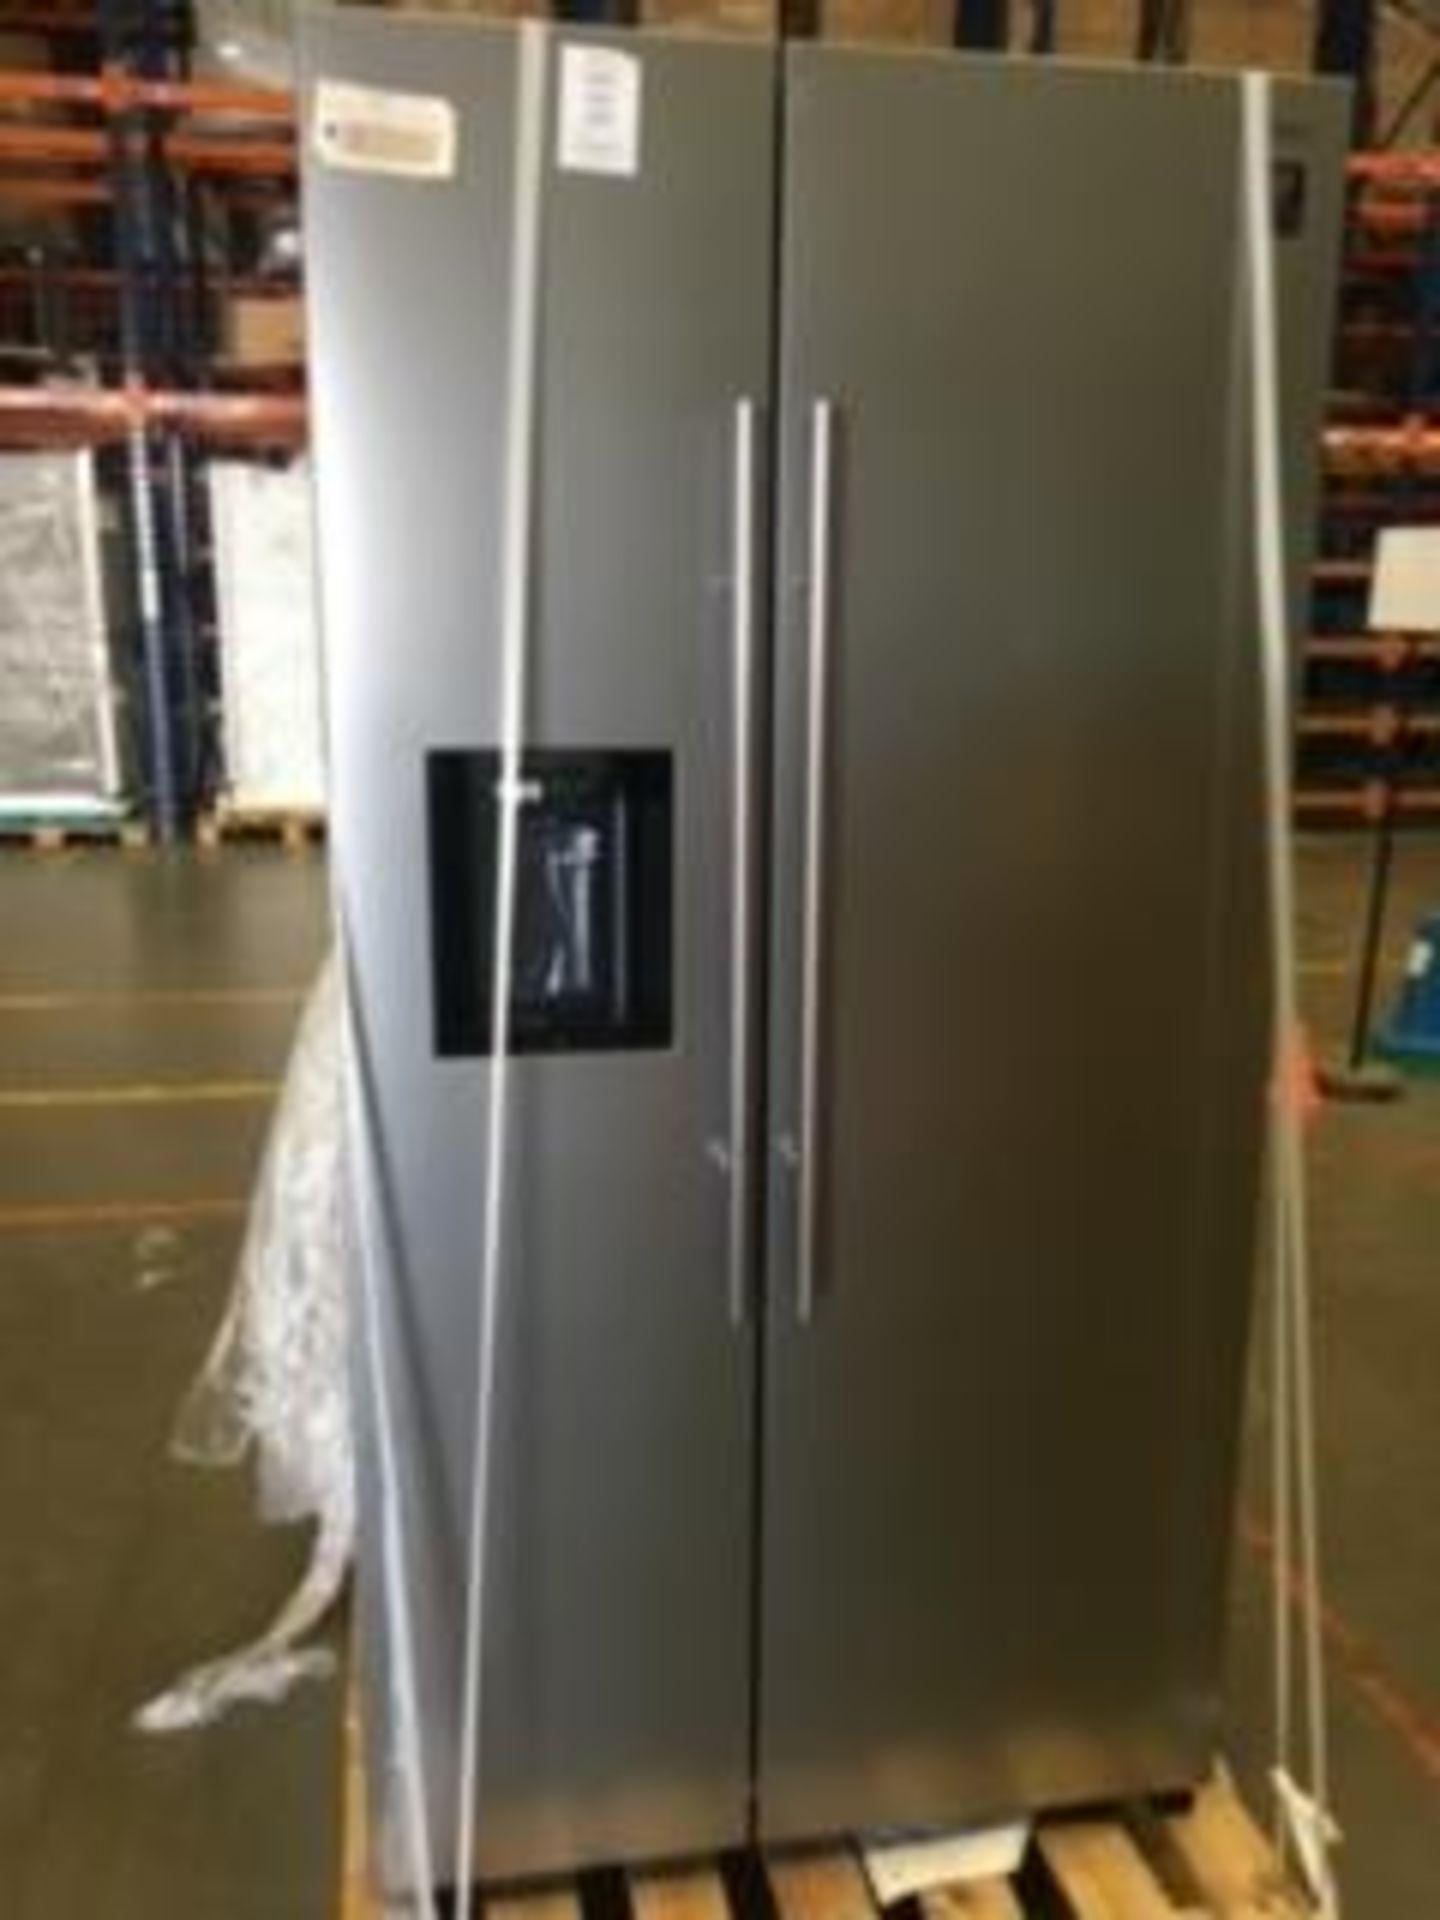 Lot 7 - Pallet of 1 Samsung Water & Ice Fridge freezer. Latest selling price £1,299.99*